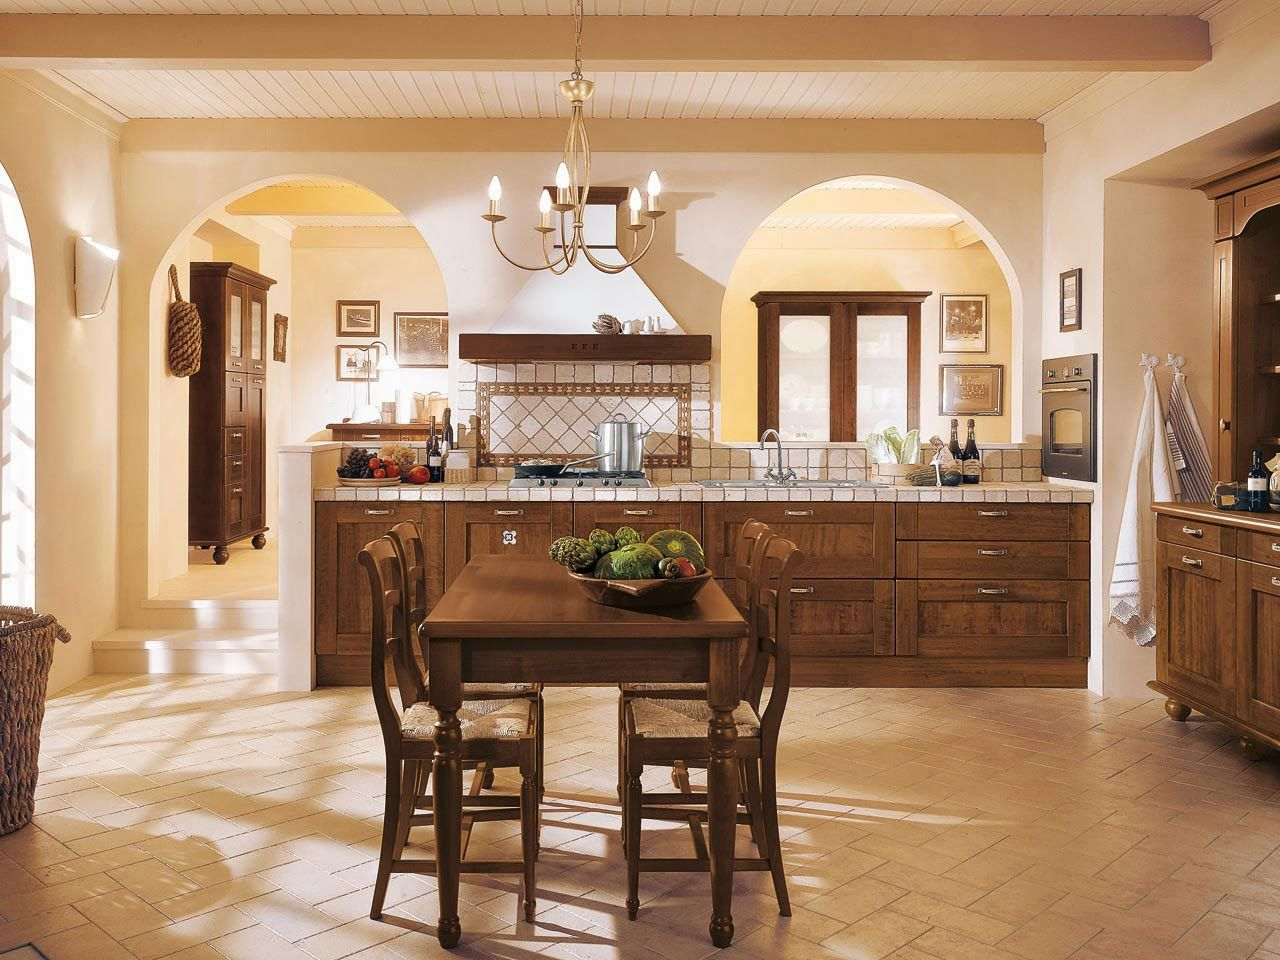 Design italian house interior design home design and decor ideas within italian house interior design 20 best italian house interior designs ideas